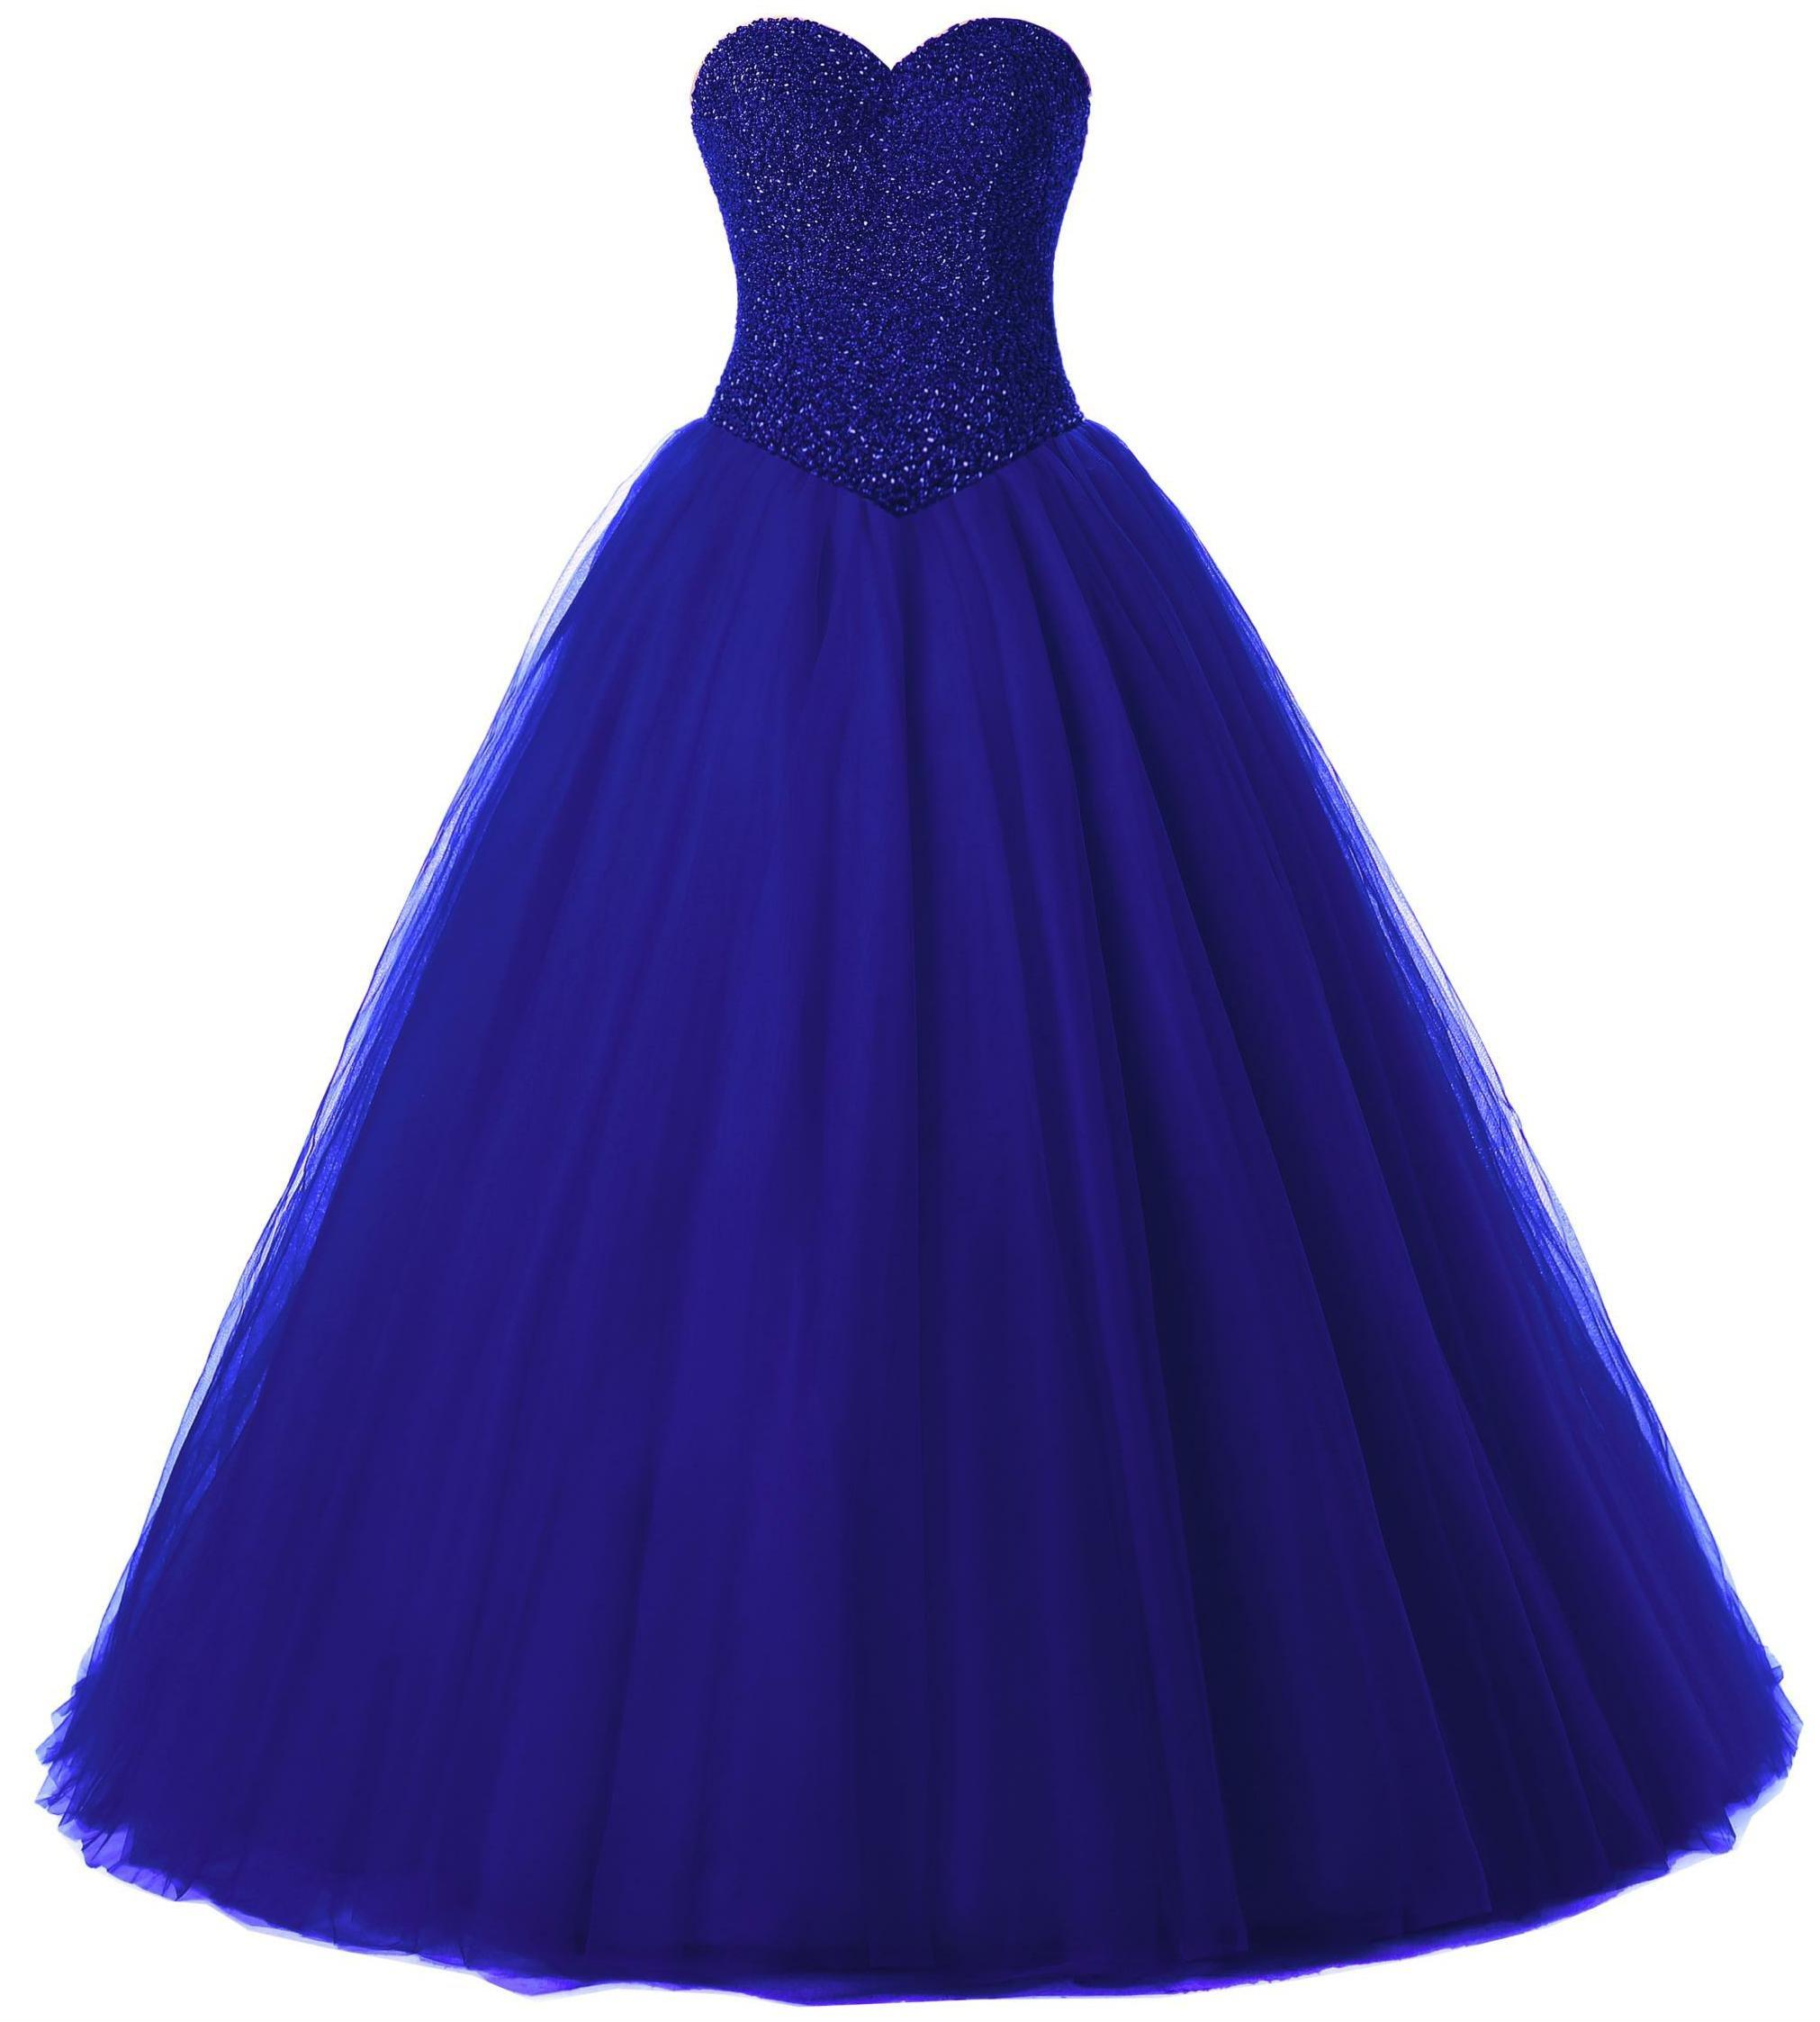 Beautyprom Women's Ball Gown Bridal Wedding Dresses (US14, Royalblue)